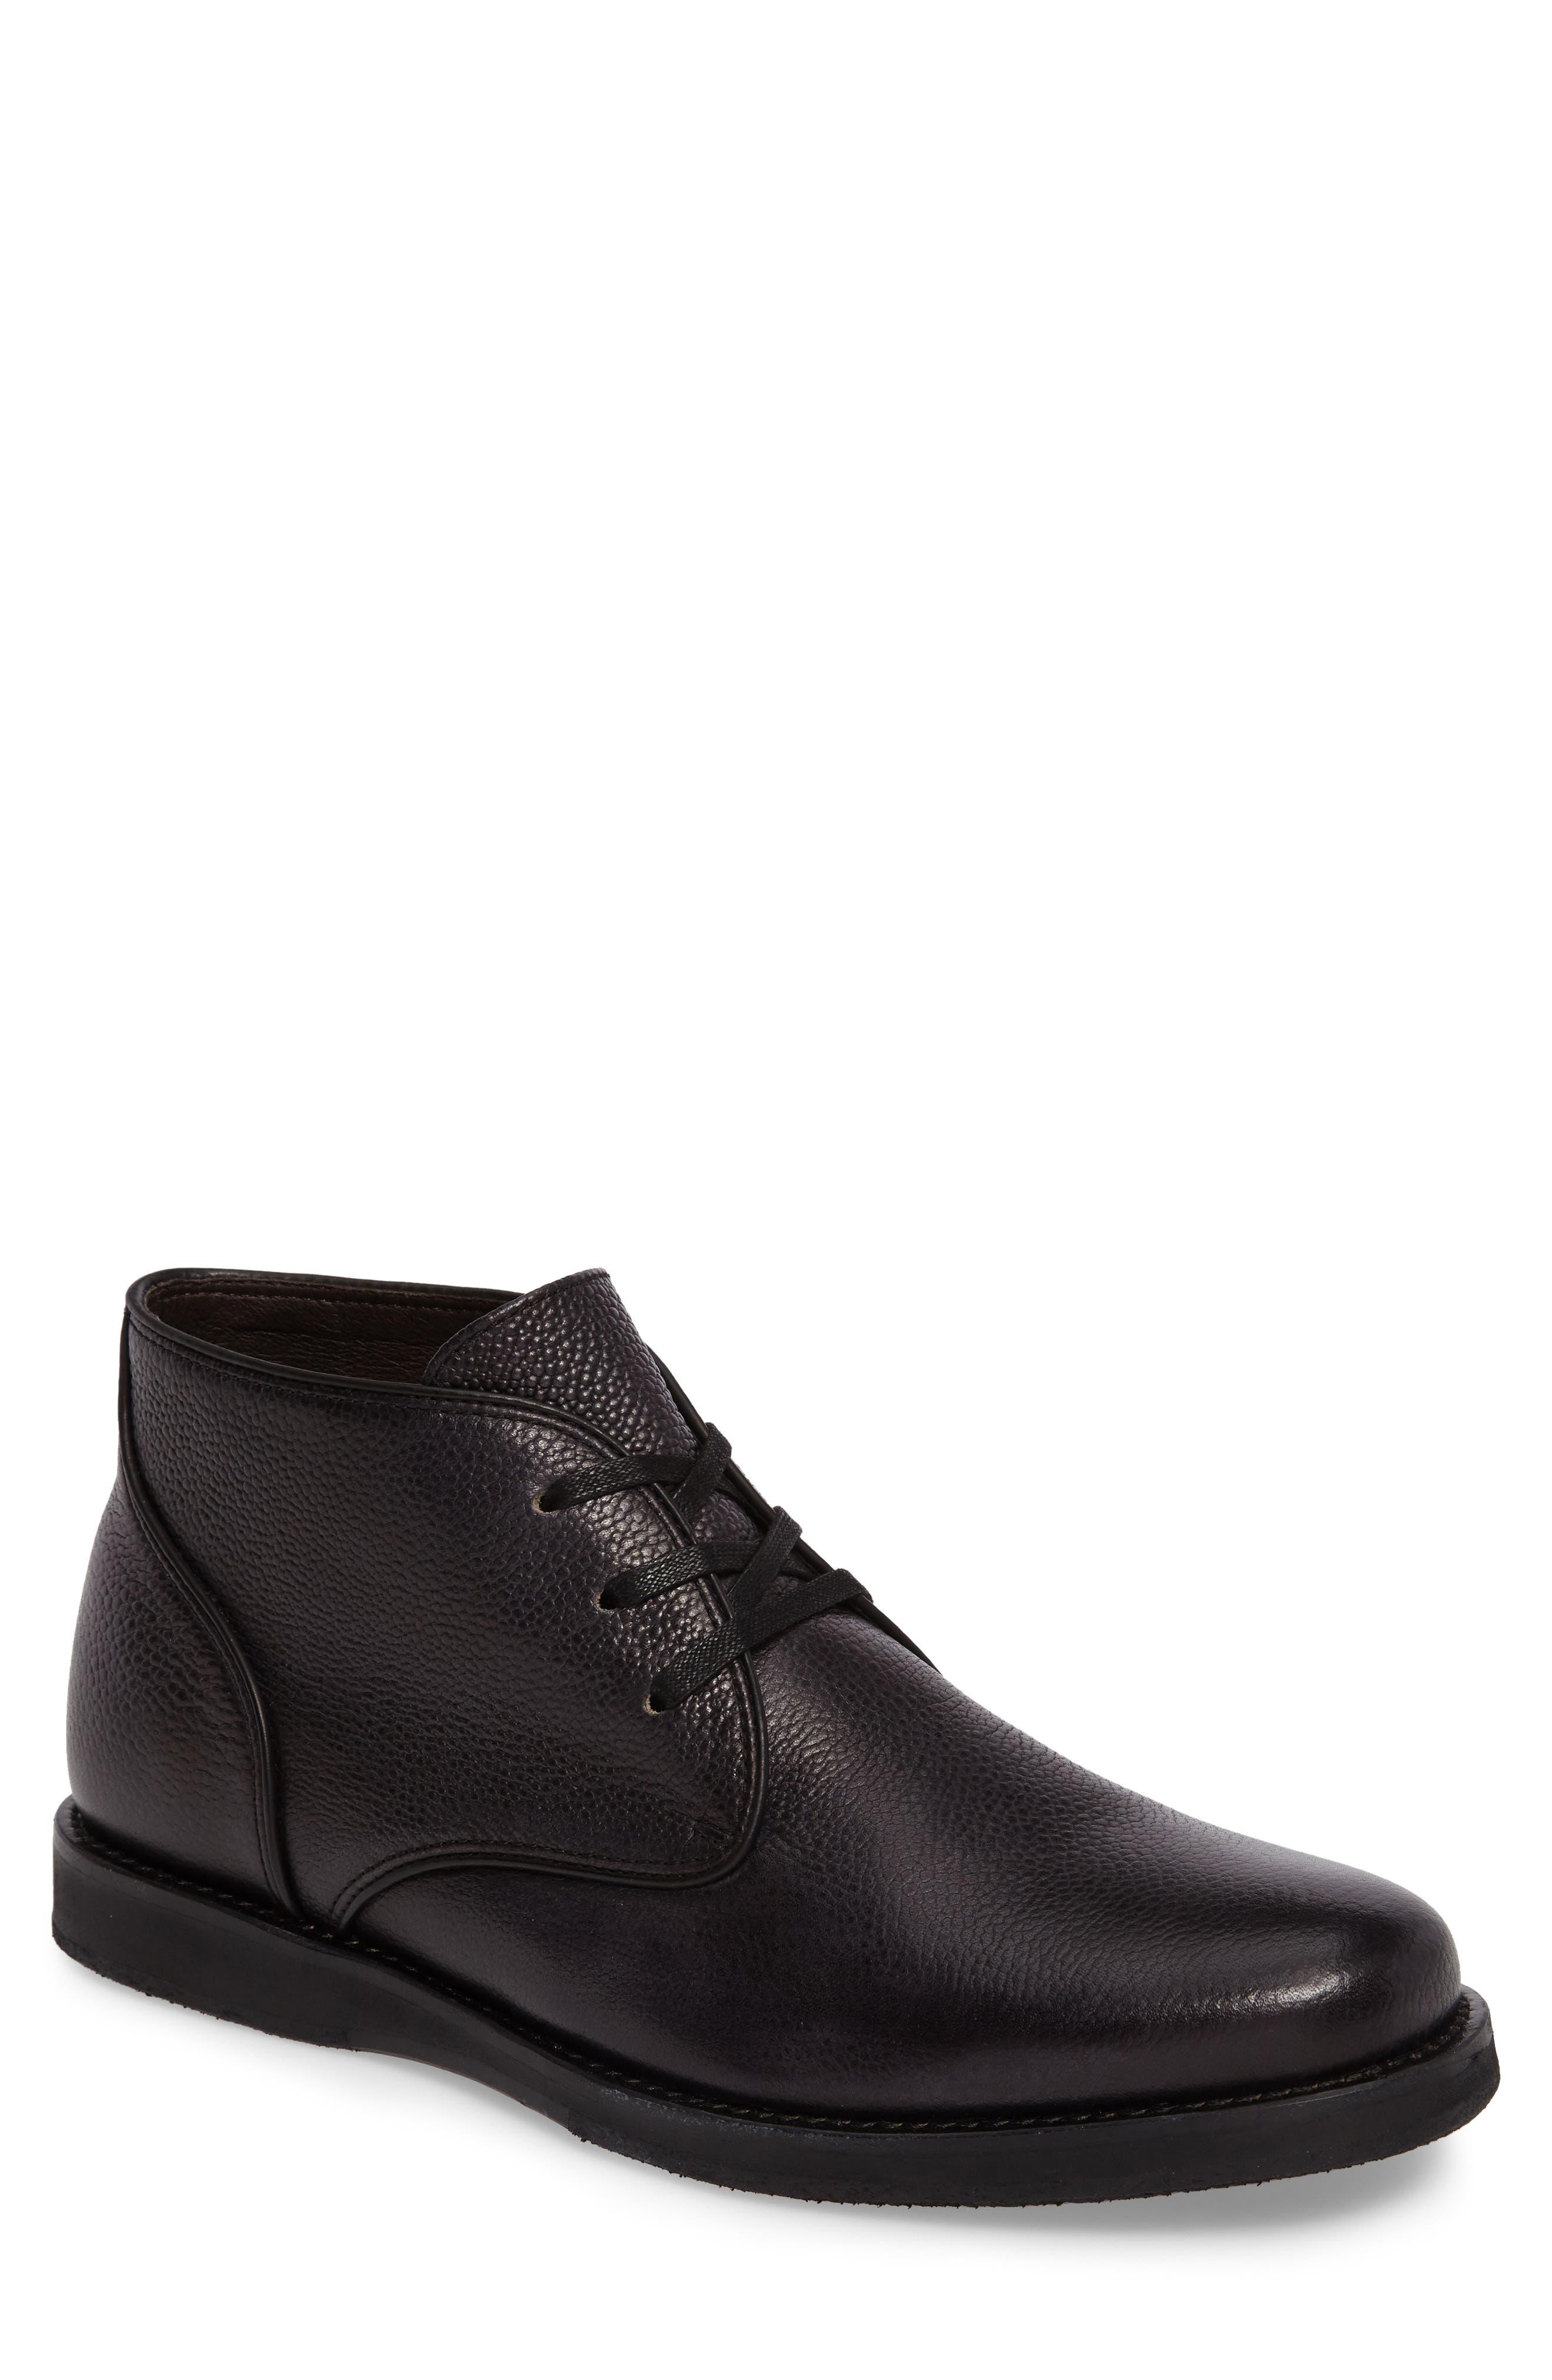 Brooklyn Chukka Boot,                         Main,                         color, Mineral Black